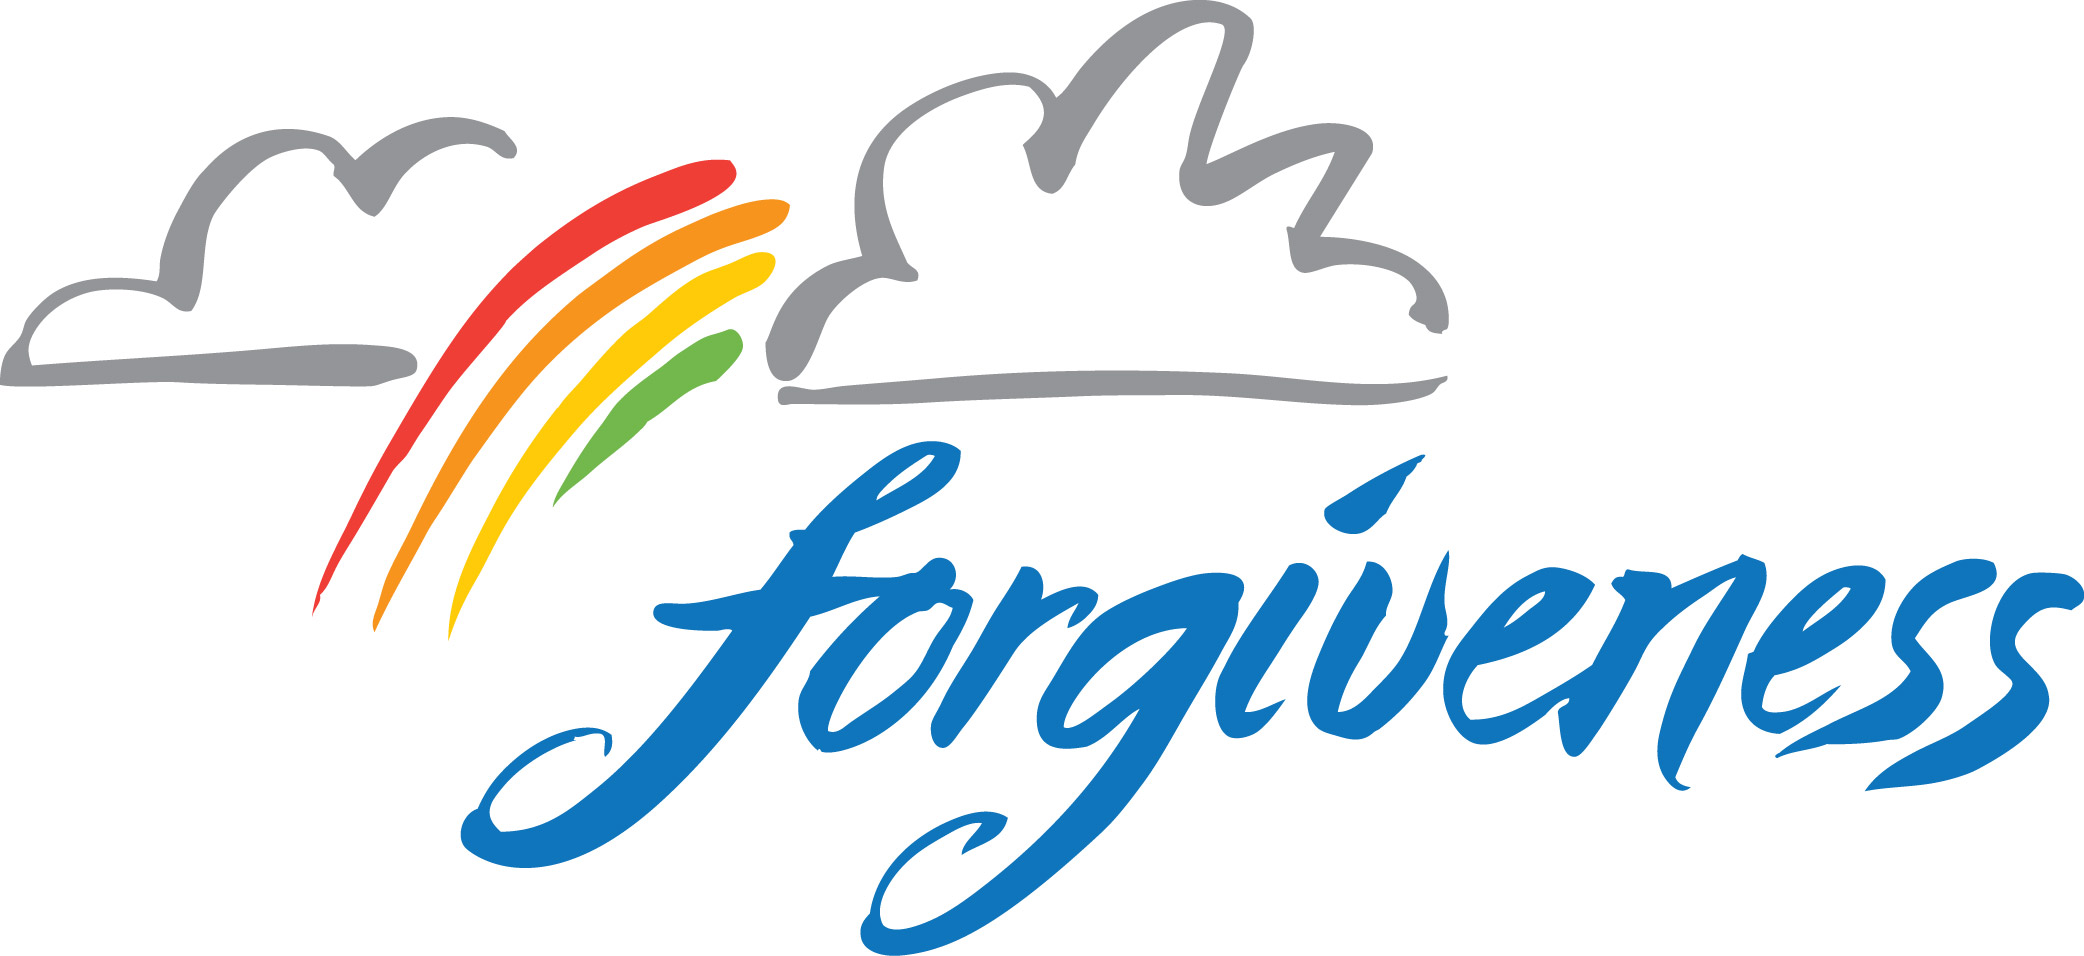 Forgiven how to use. Forgiveness clipart